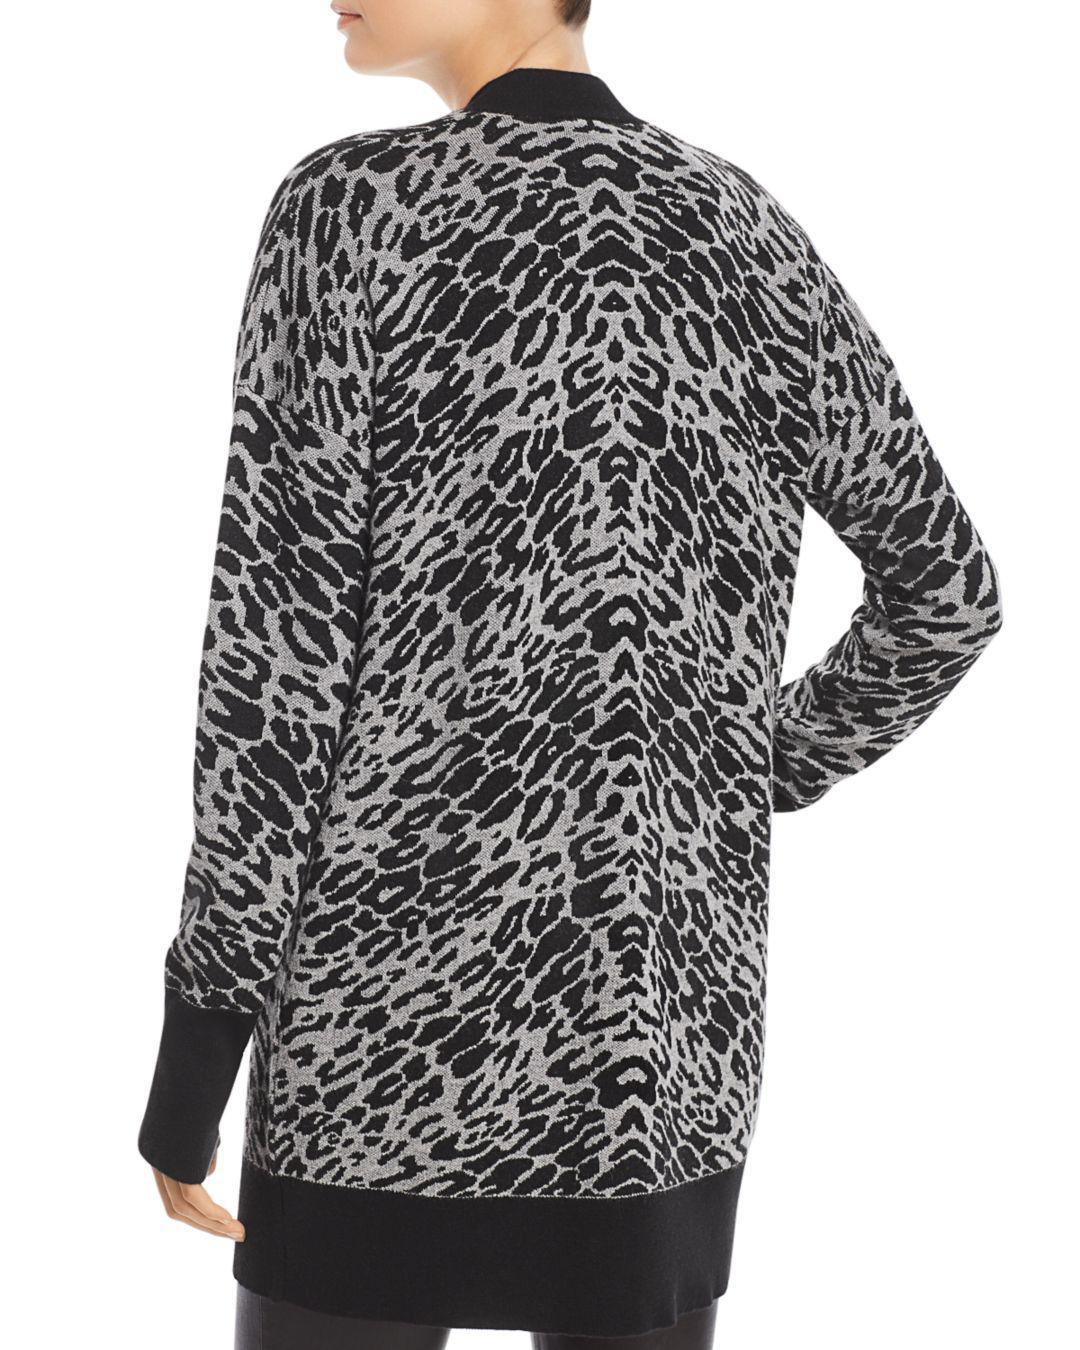 9b69732c6cd1 Equipment Fenwick Leopard-print Cardigan in Black - Save 60% - Lyst